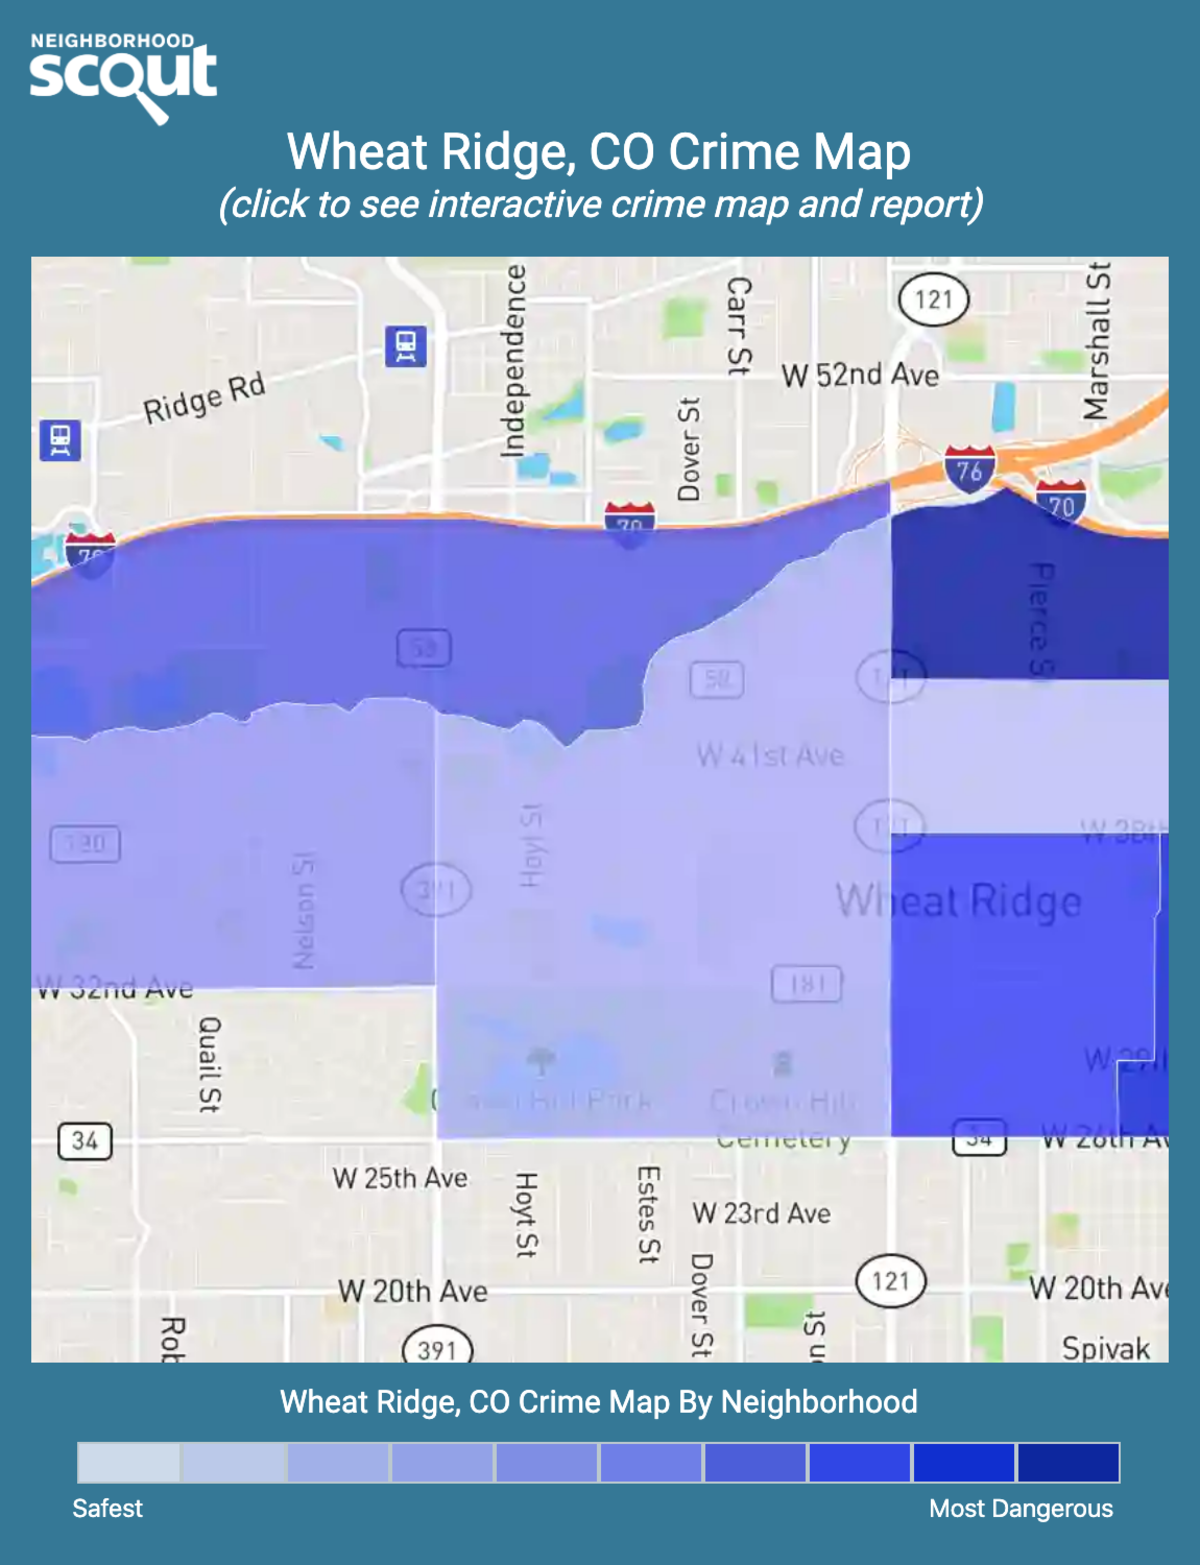 Wheat Ridge, Colorado crime map